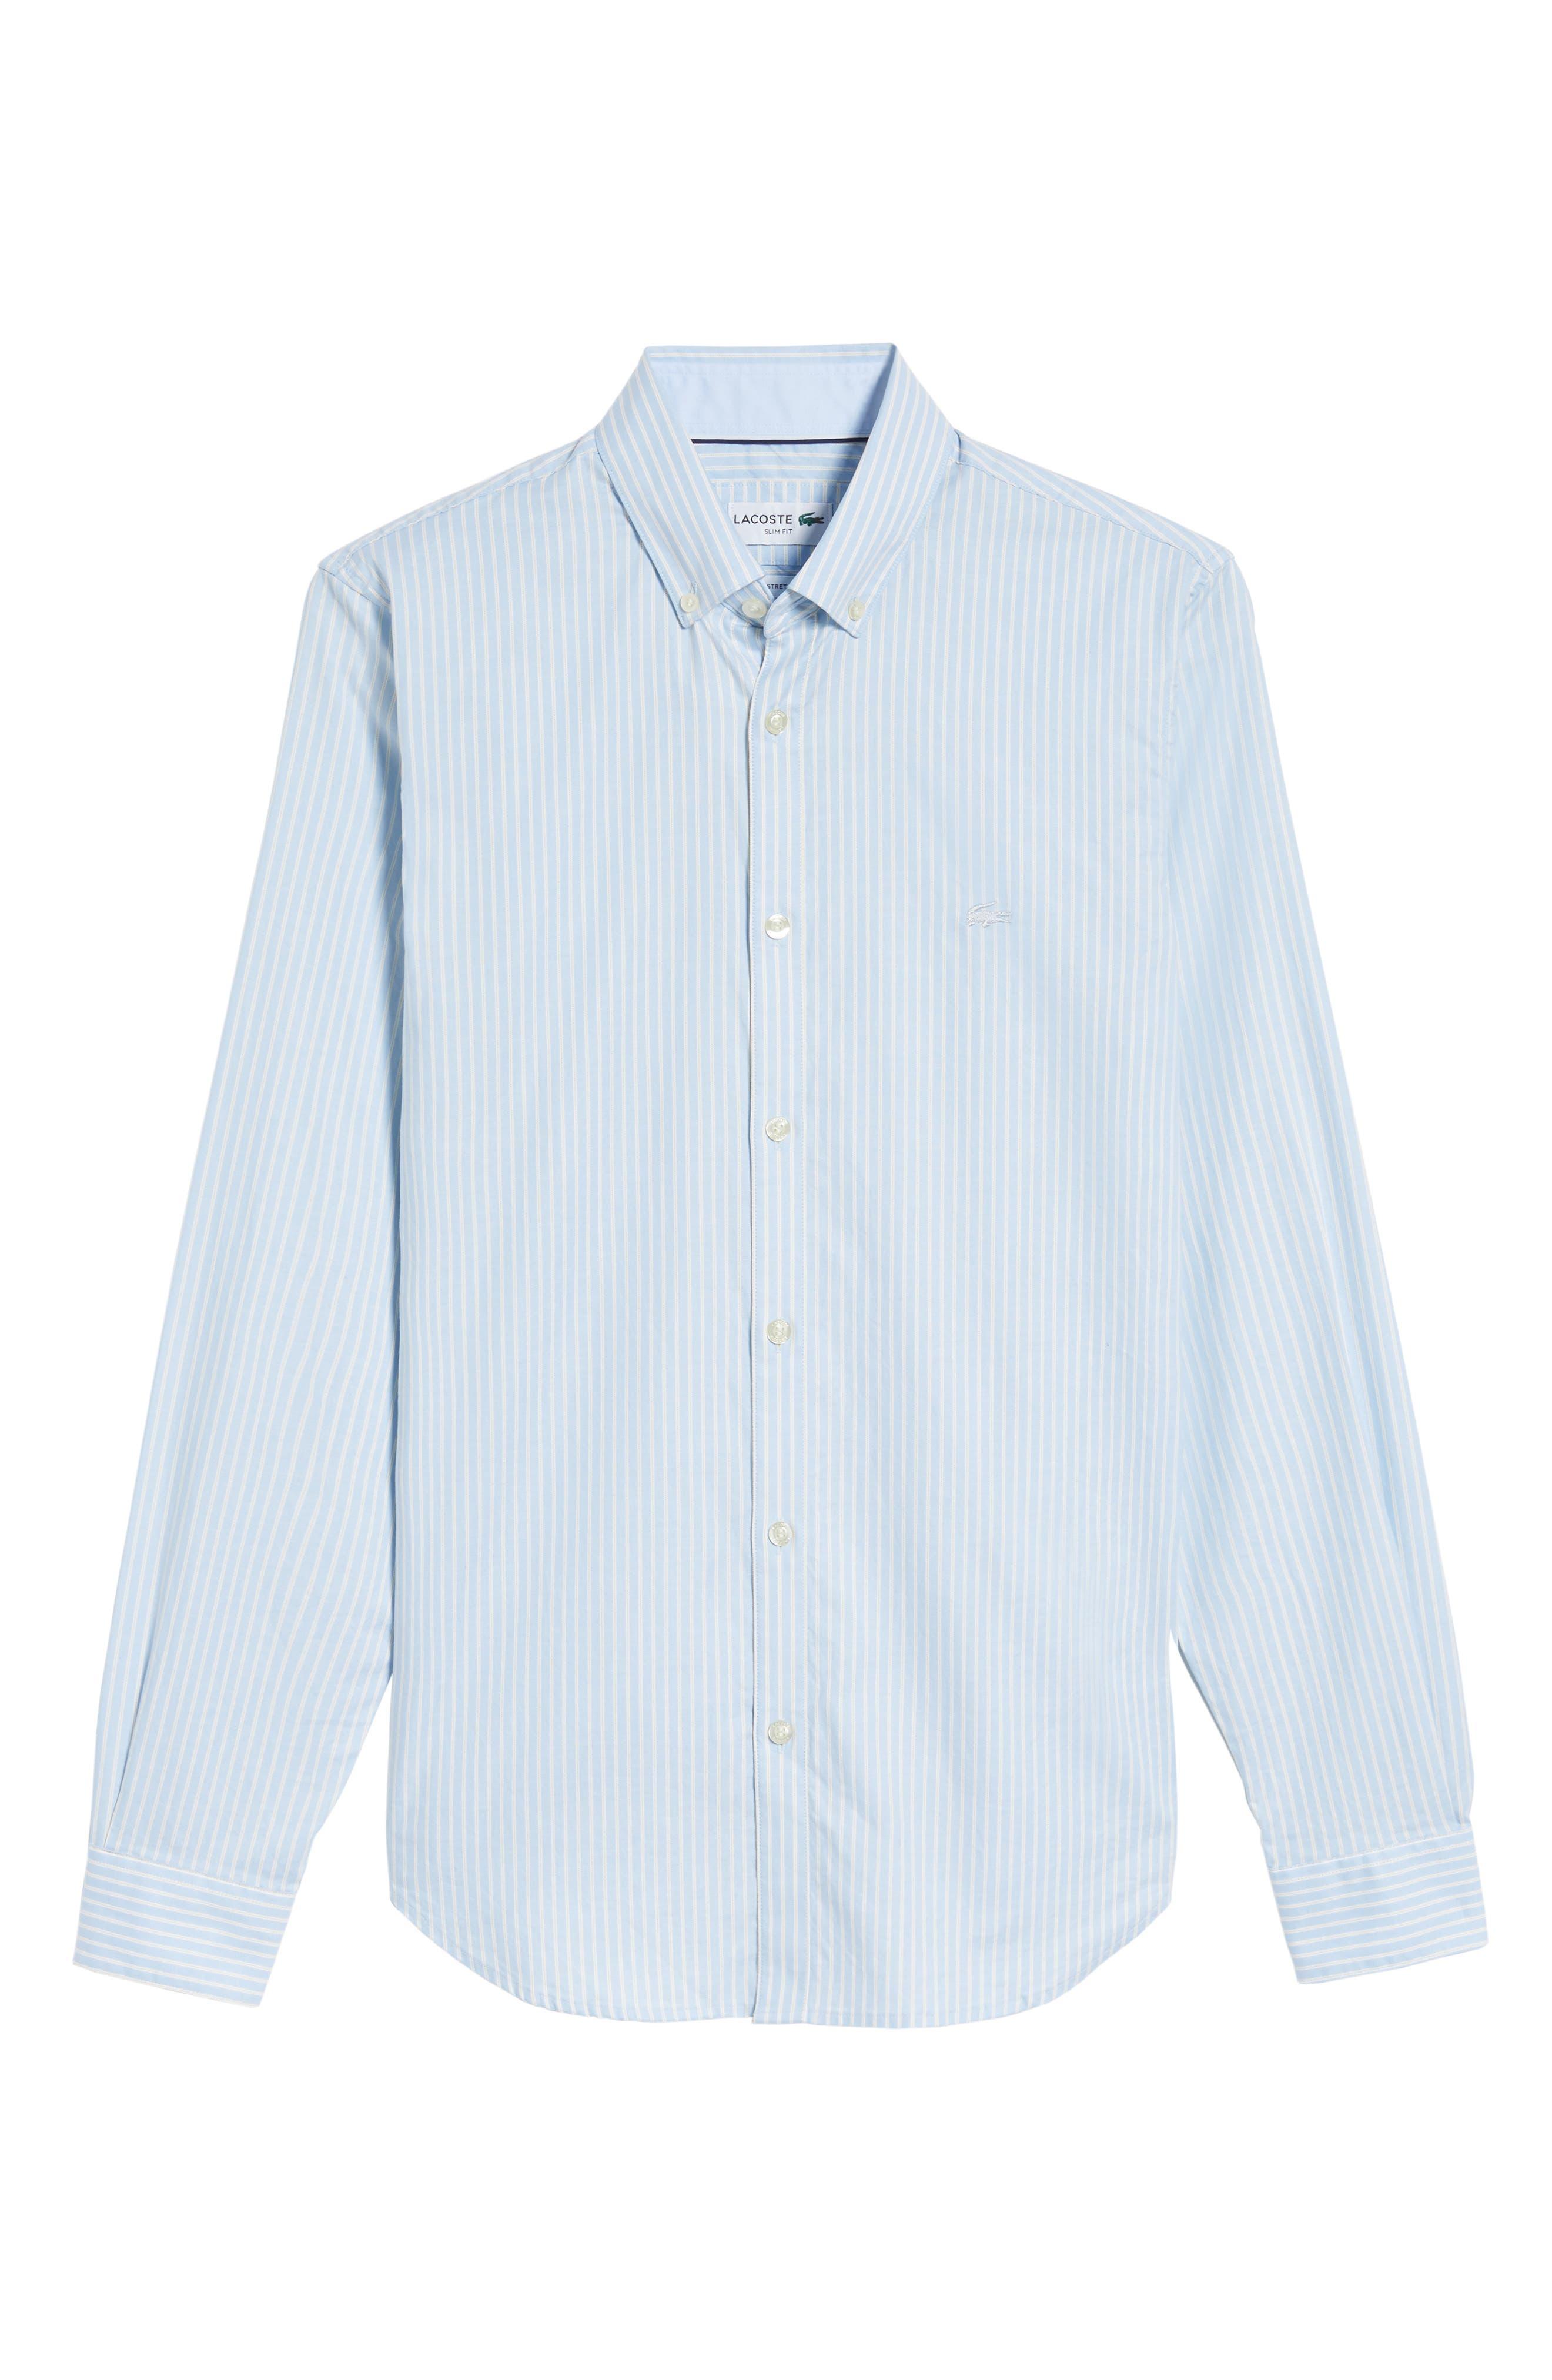 LACOSTE,                             Slim Fit Stripe Shirt,                             Alternate thumbnail 6, color,                             436